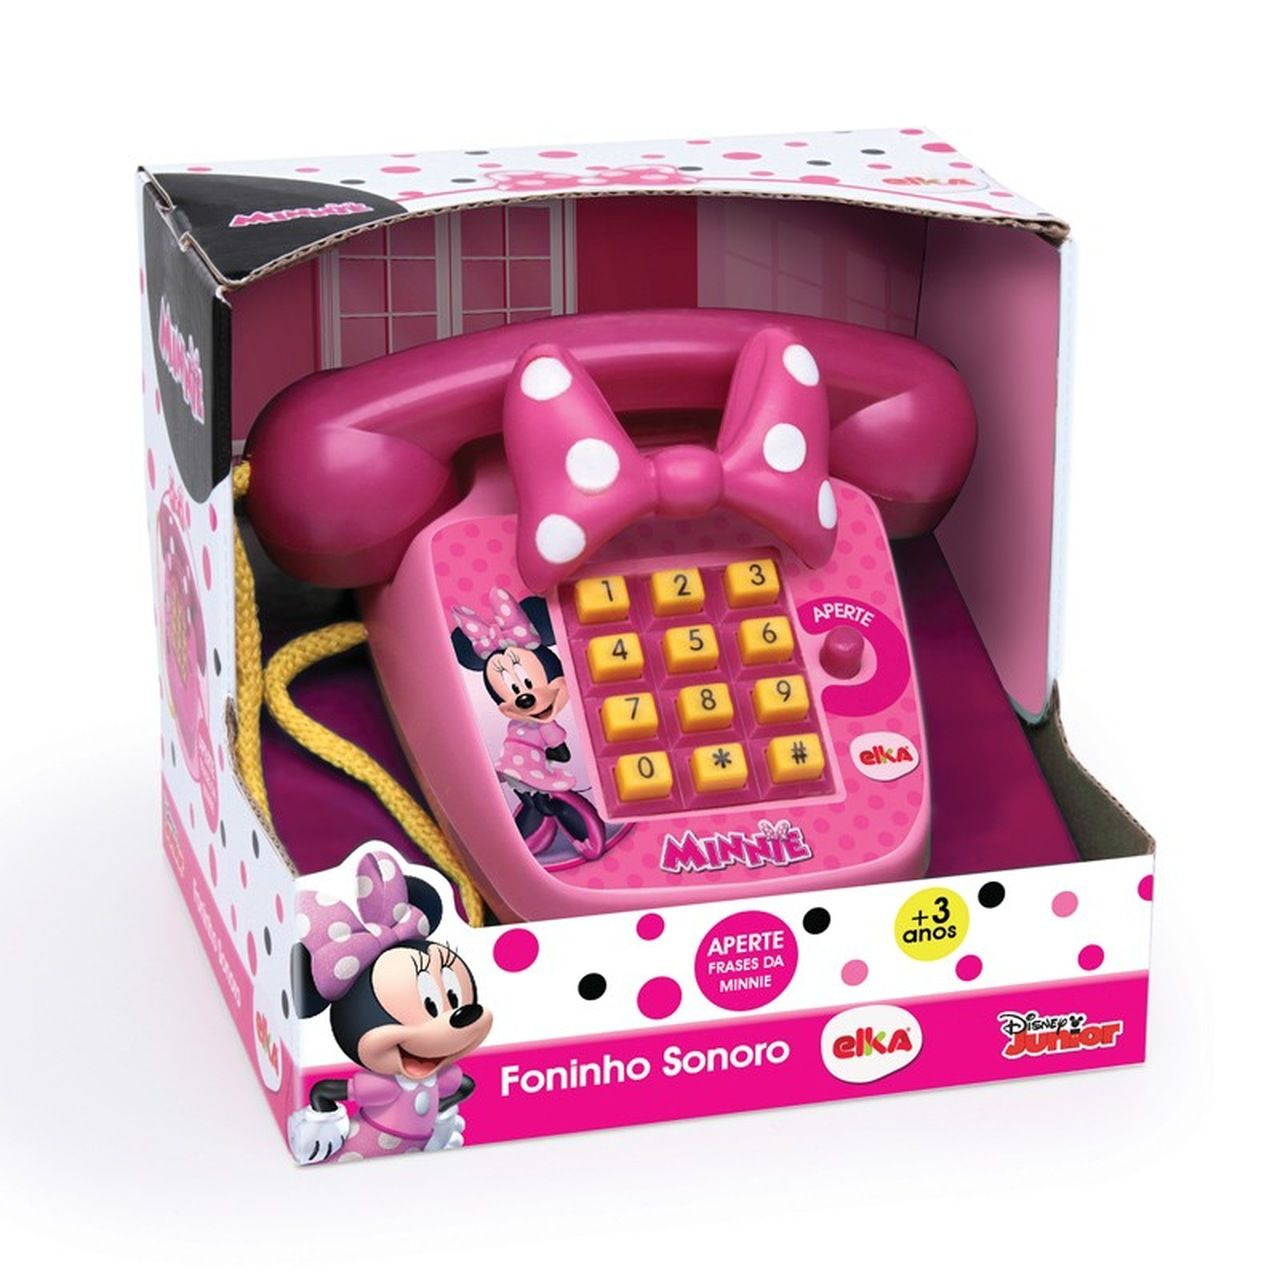 Telefone Infantil Foninho Sonoro Minnie - Elka 1061